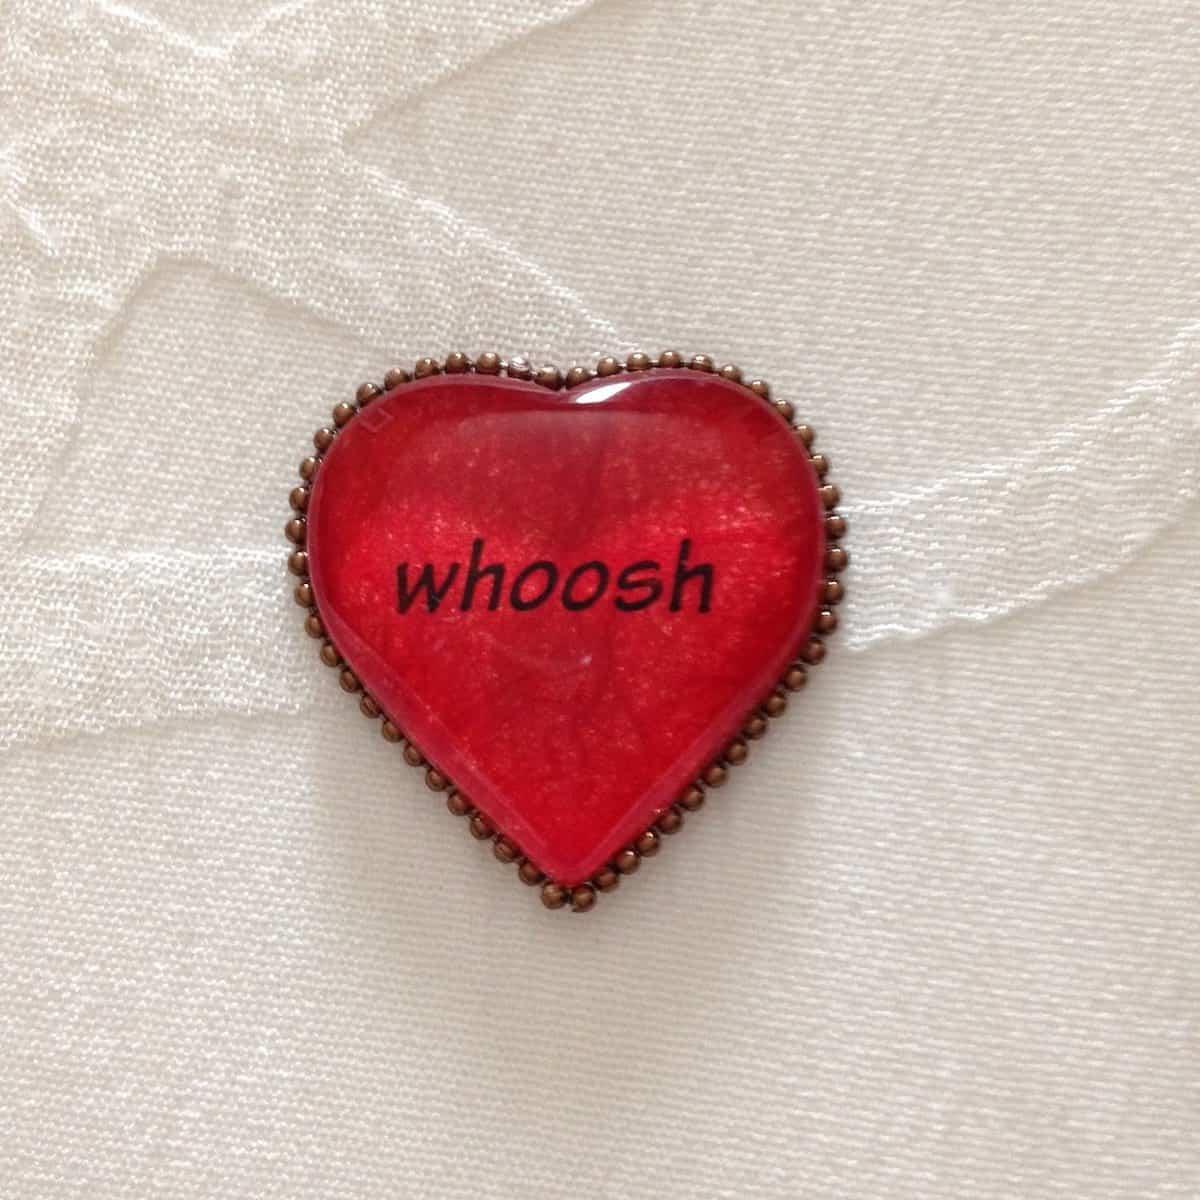 whoosh heart